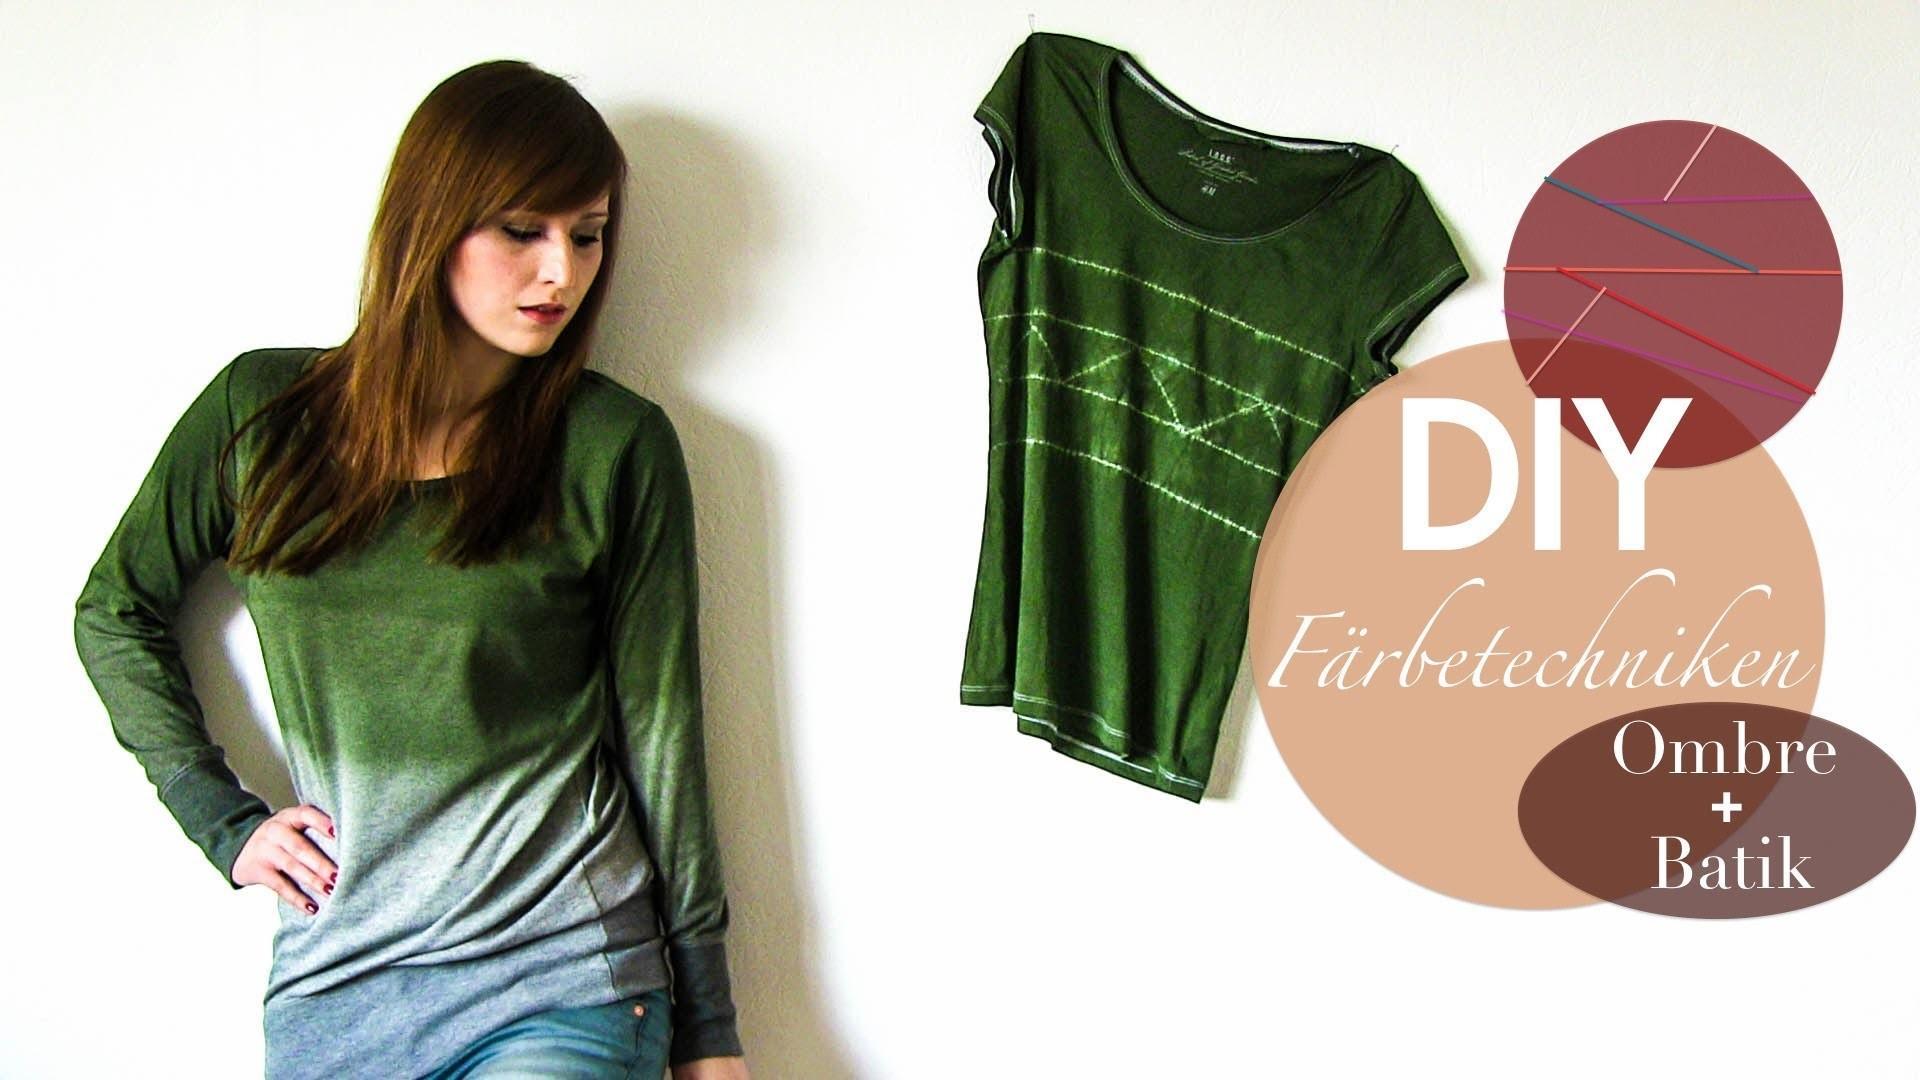 DIY Färbetechniken - Ombre Shirt + Ethno Style T-Shirt